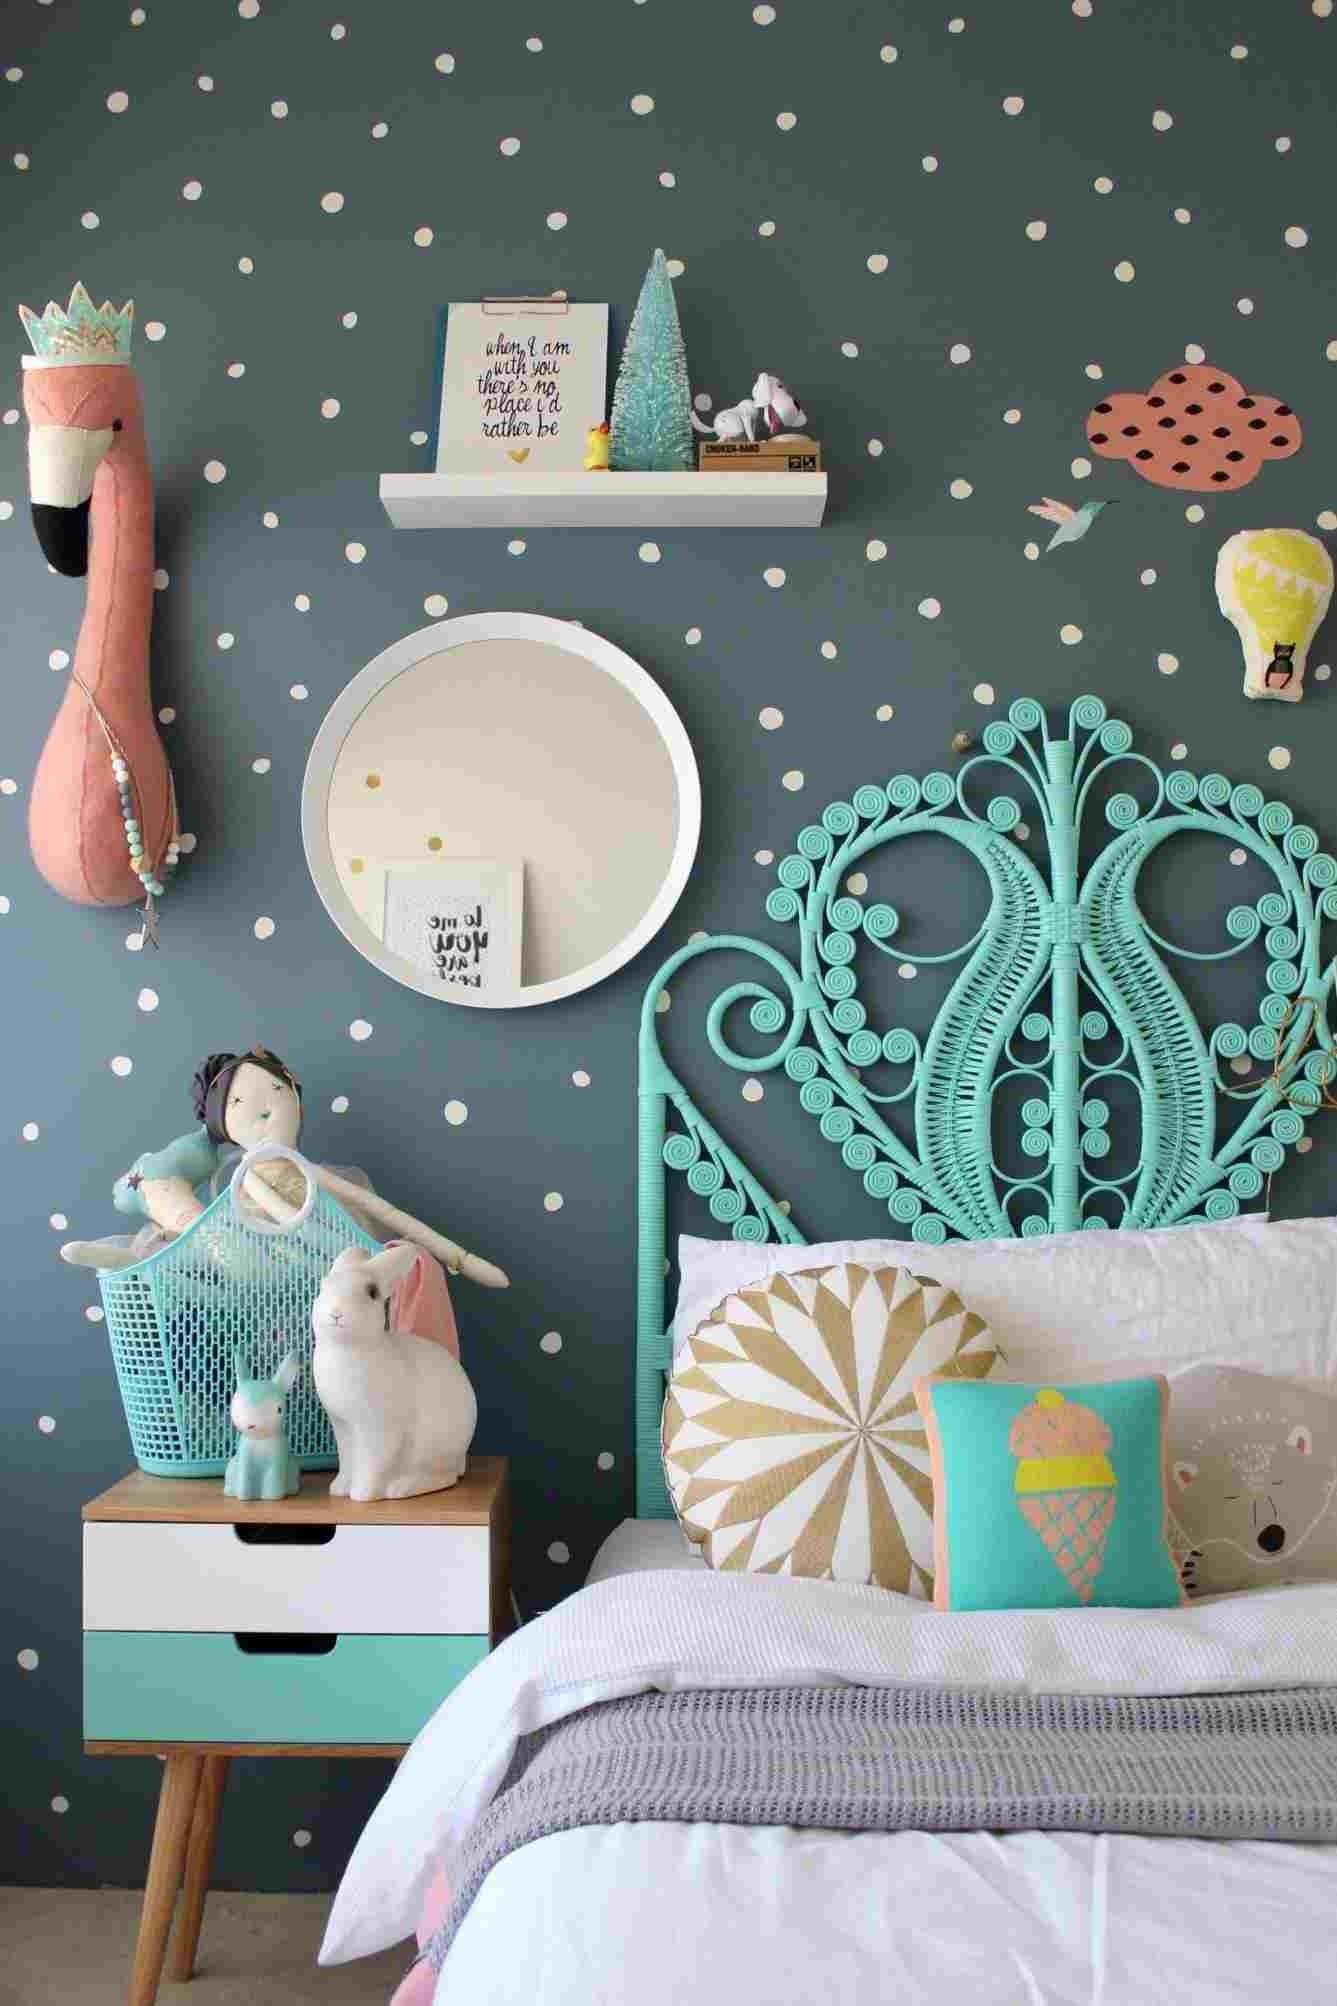 Rainbow Wallpaper Kids Room Info Cool Play Ideas Stunning - Boho Girls Room Ideas - HD Wallpaper